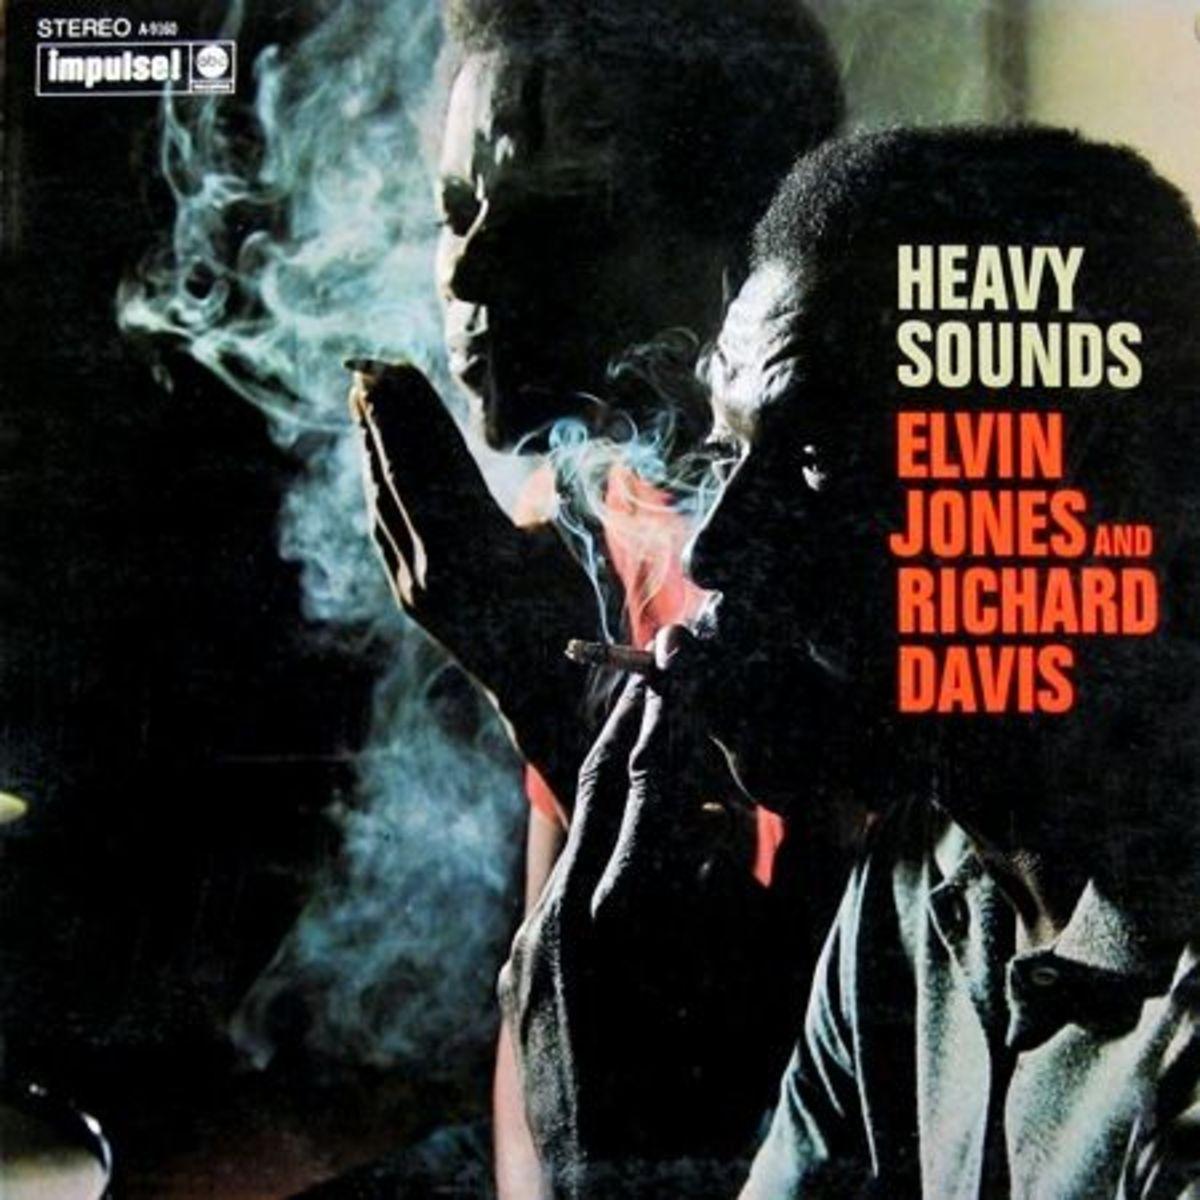 "Elvin Jones & Richard Davis ""Heavy Sounds"" Impulse Records A-9160 12"" LP Vinyl Record (1968) Album Cover Design by Robert & Barbara Flynn, Photo by Charles Stewart"